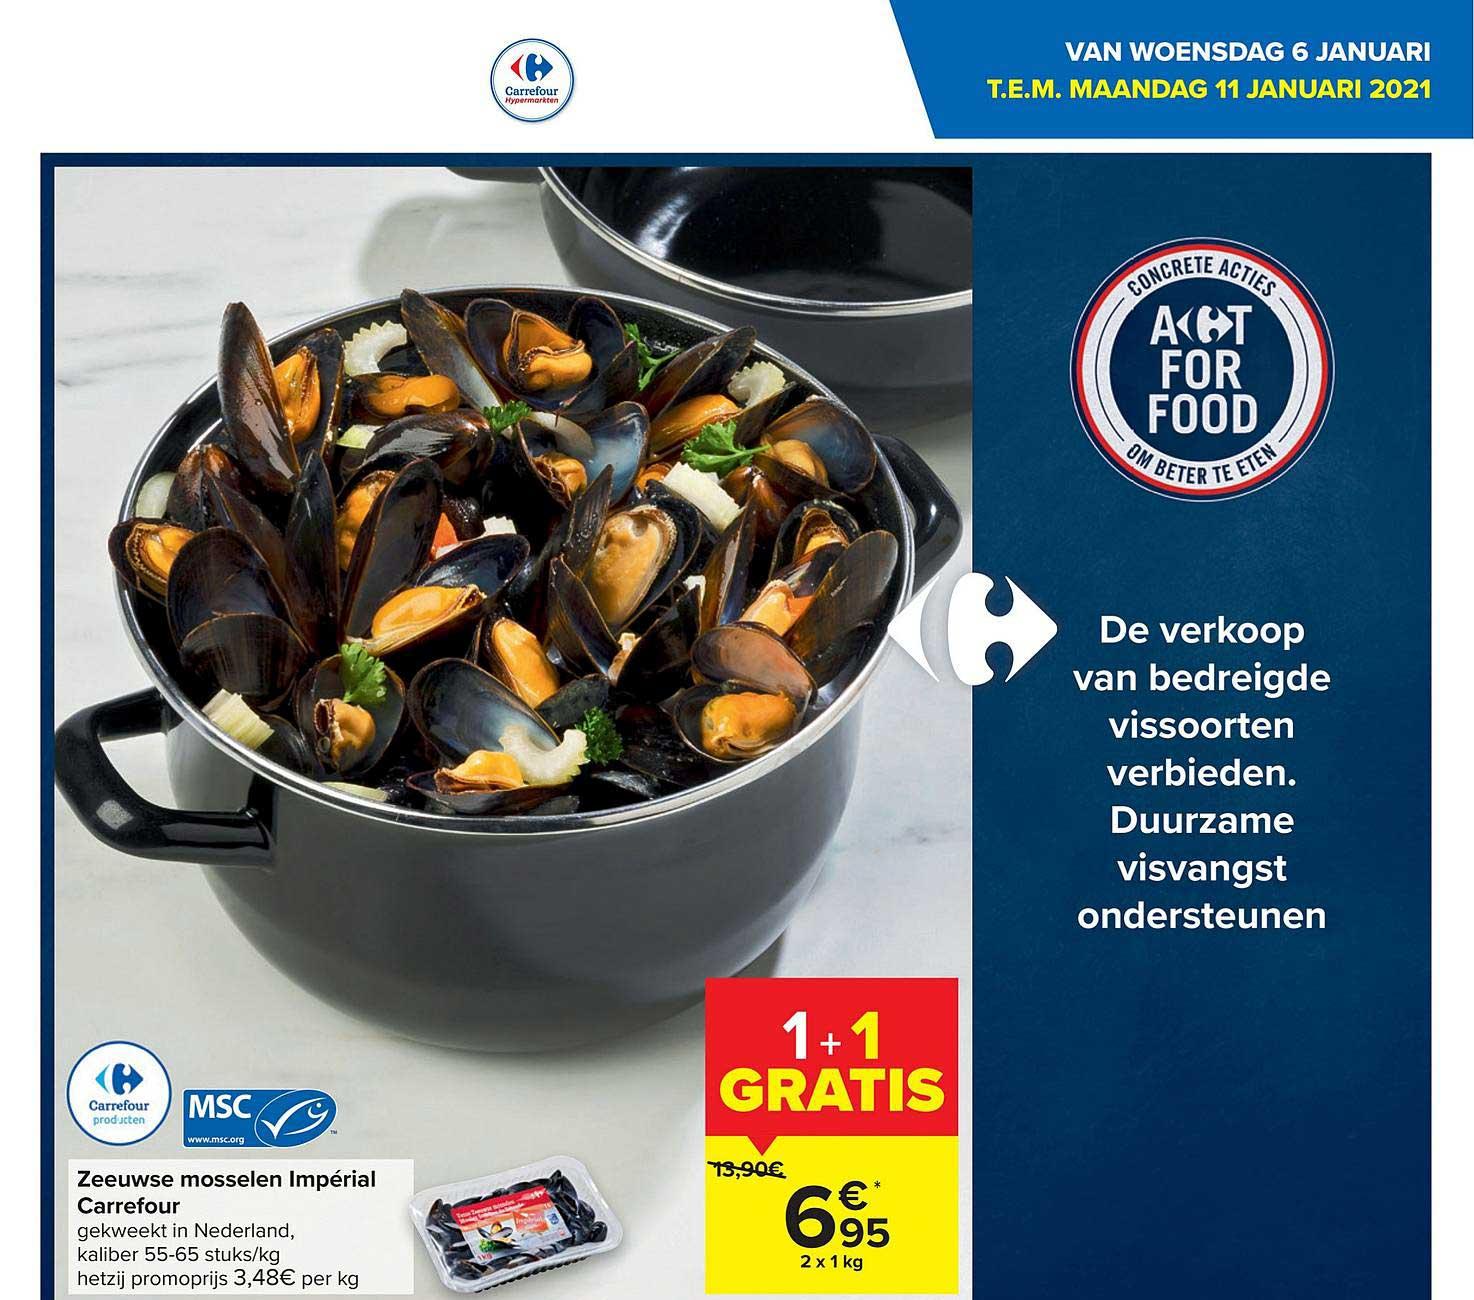 Carrefour Zeeuwse Mosselen Imperial Carrefour 1+1 Gratis